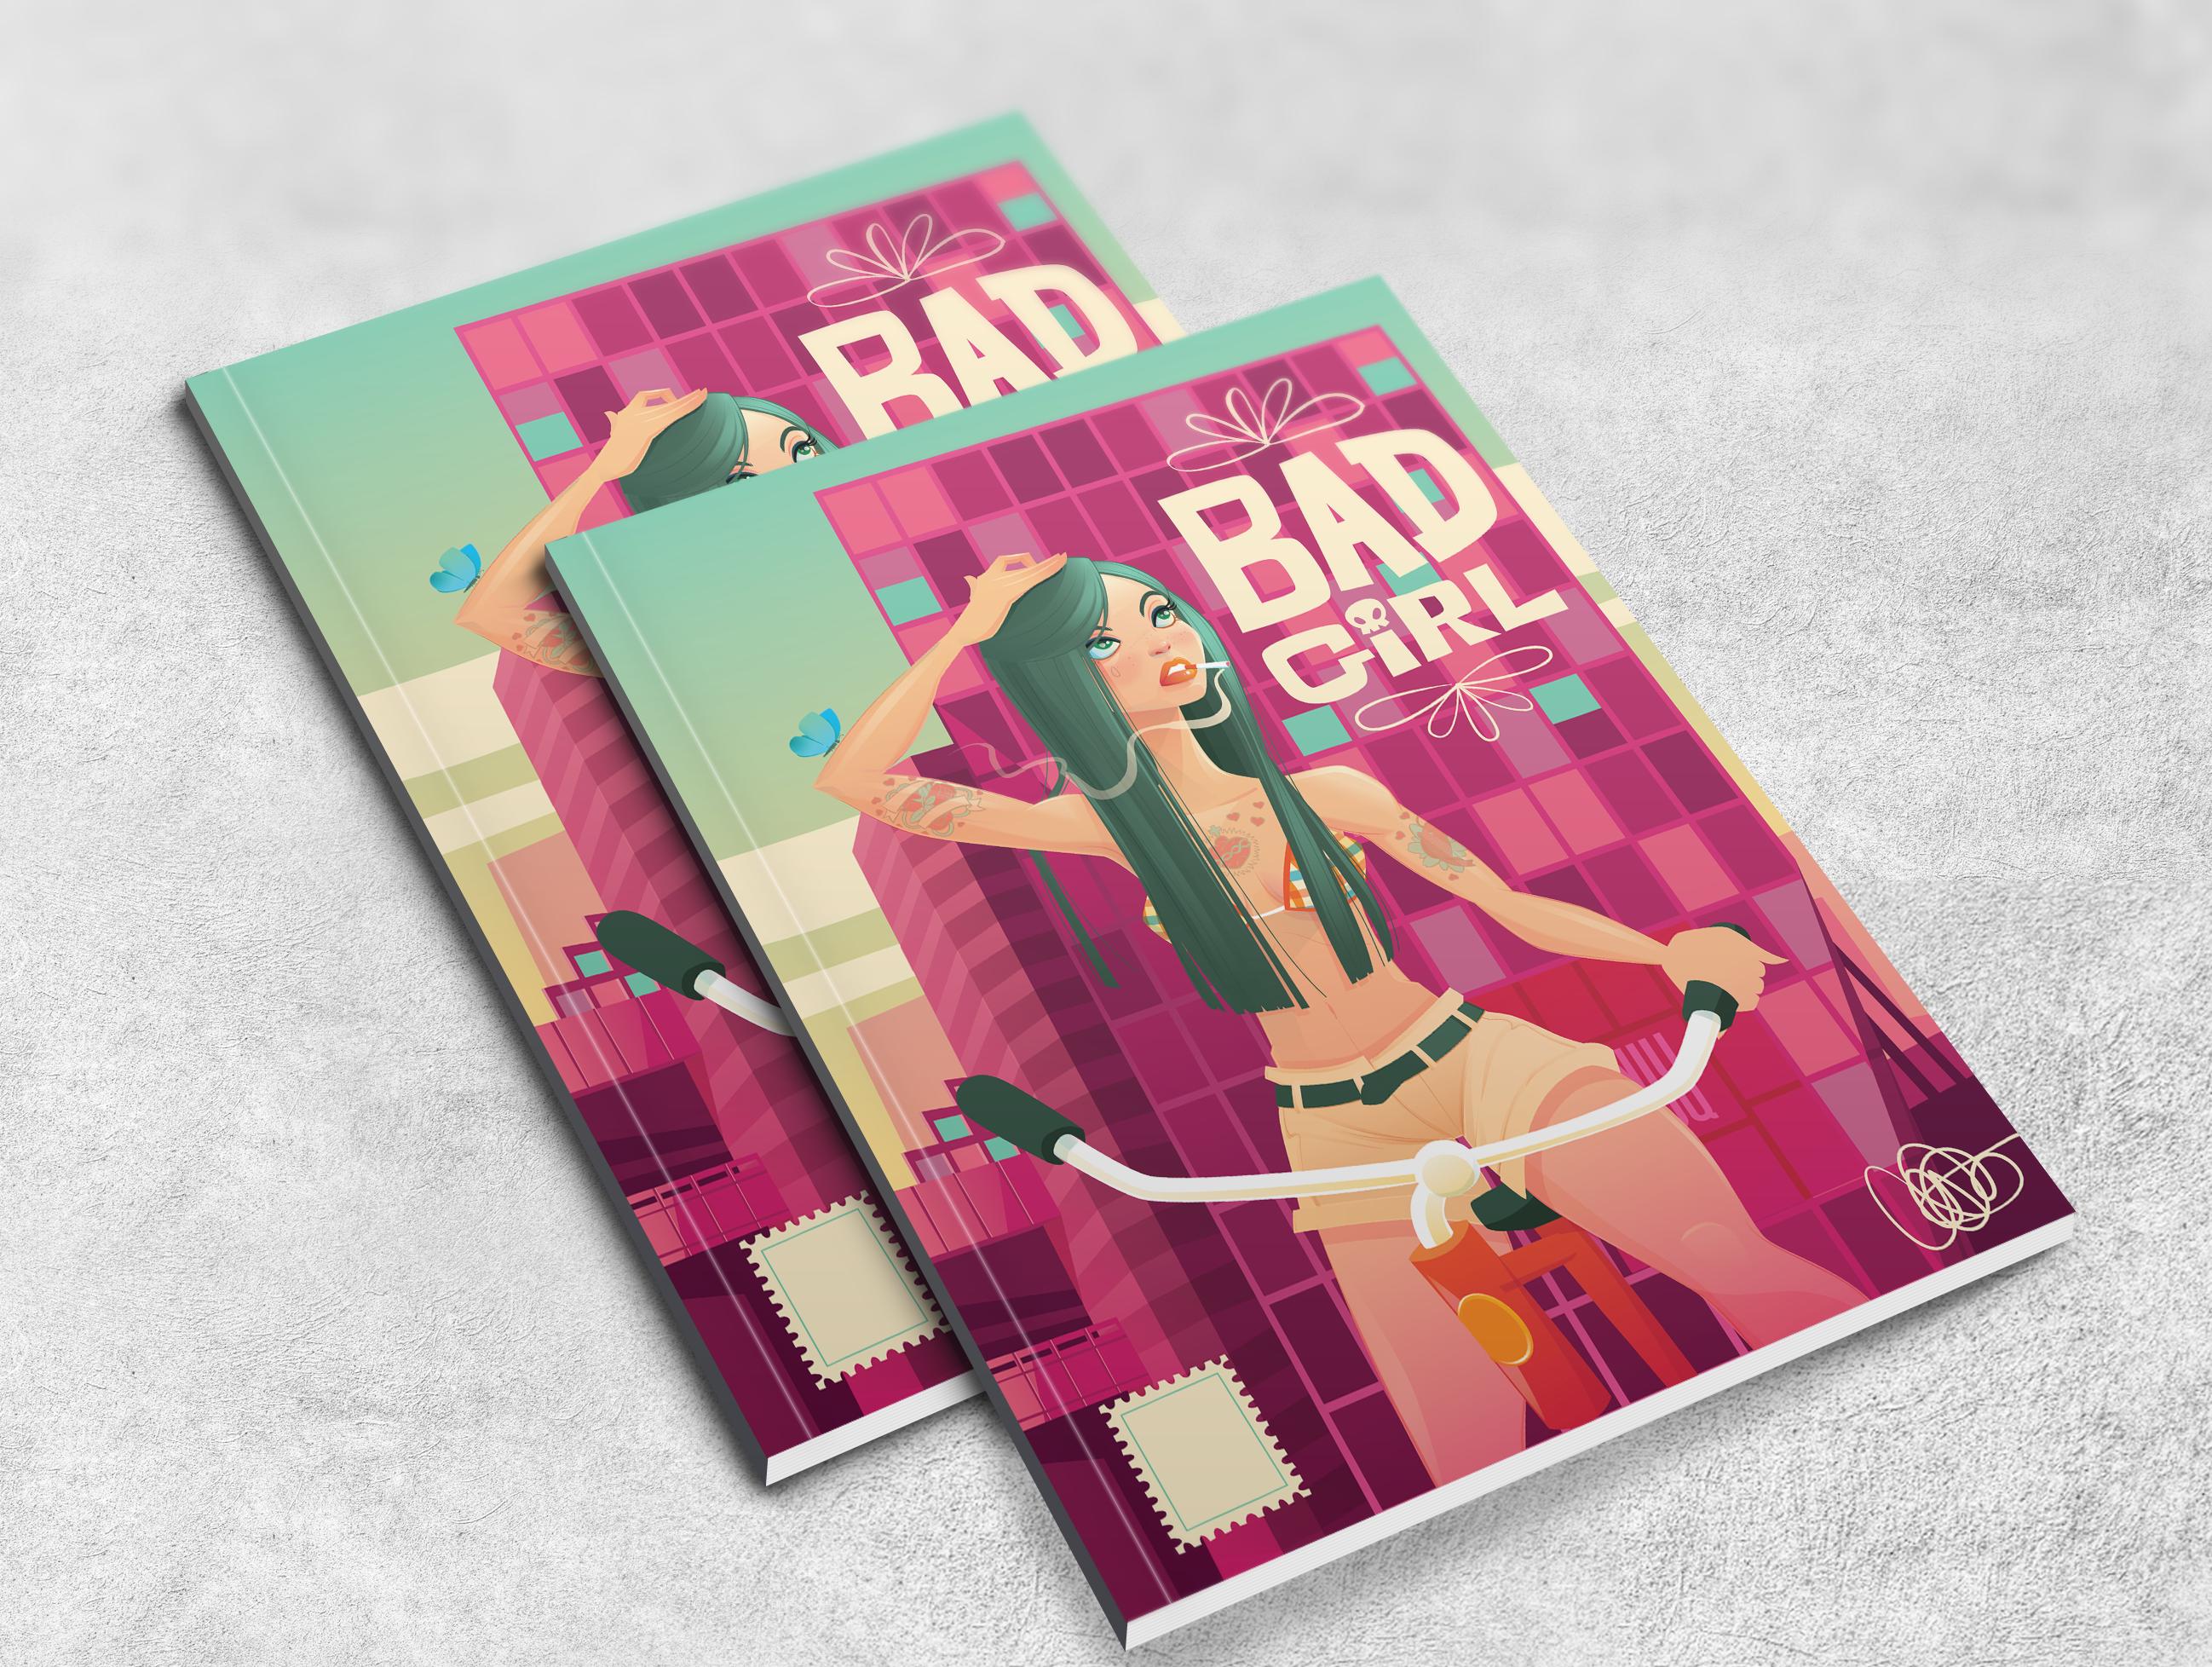 查看《Bad Girl》原图,原图尺寸:2596x1956